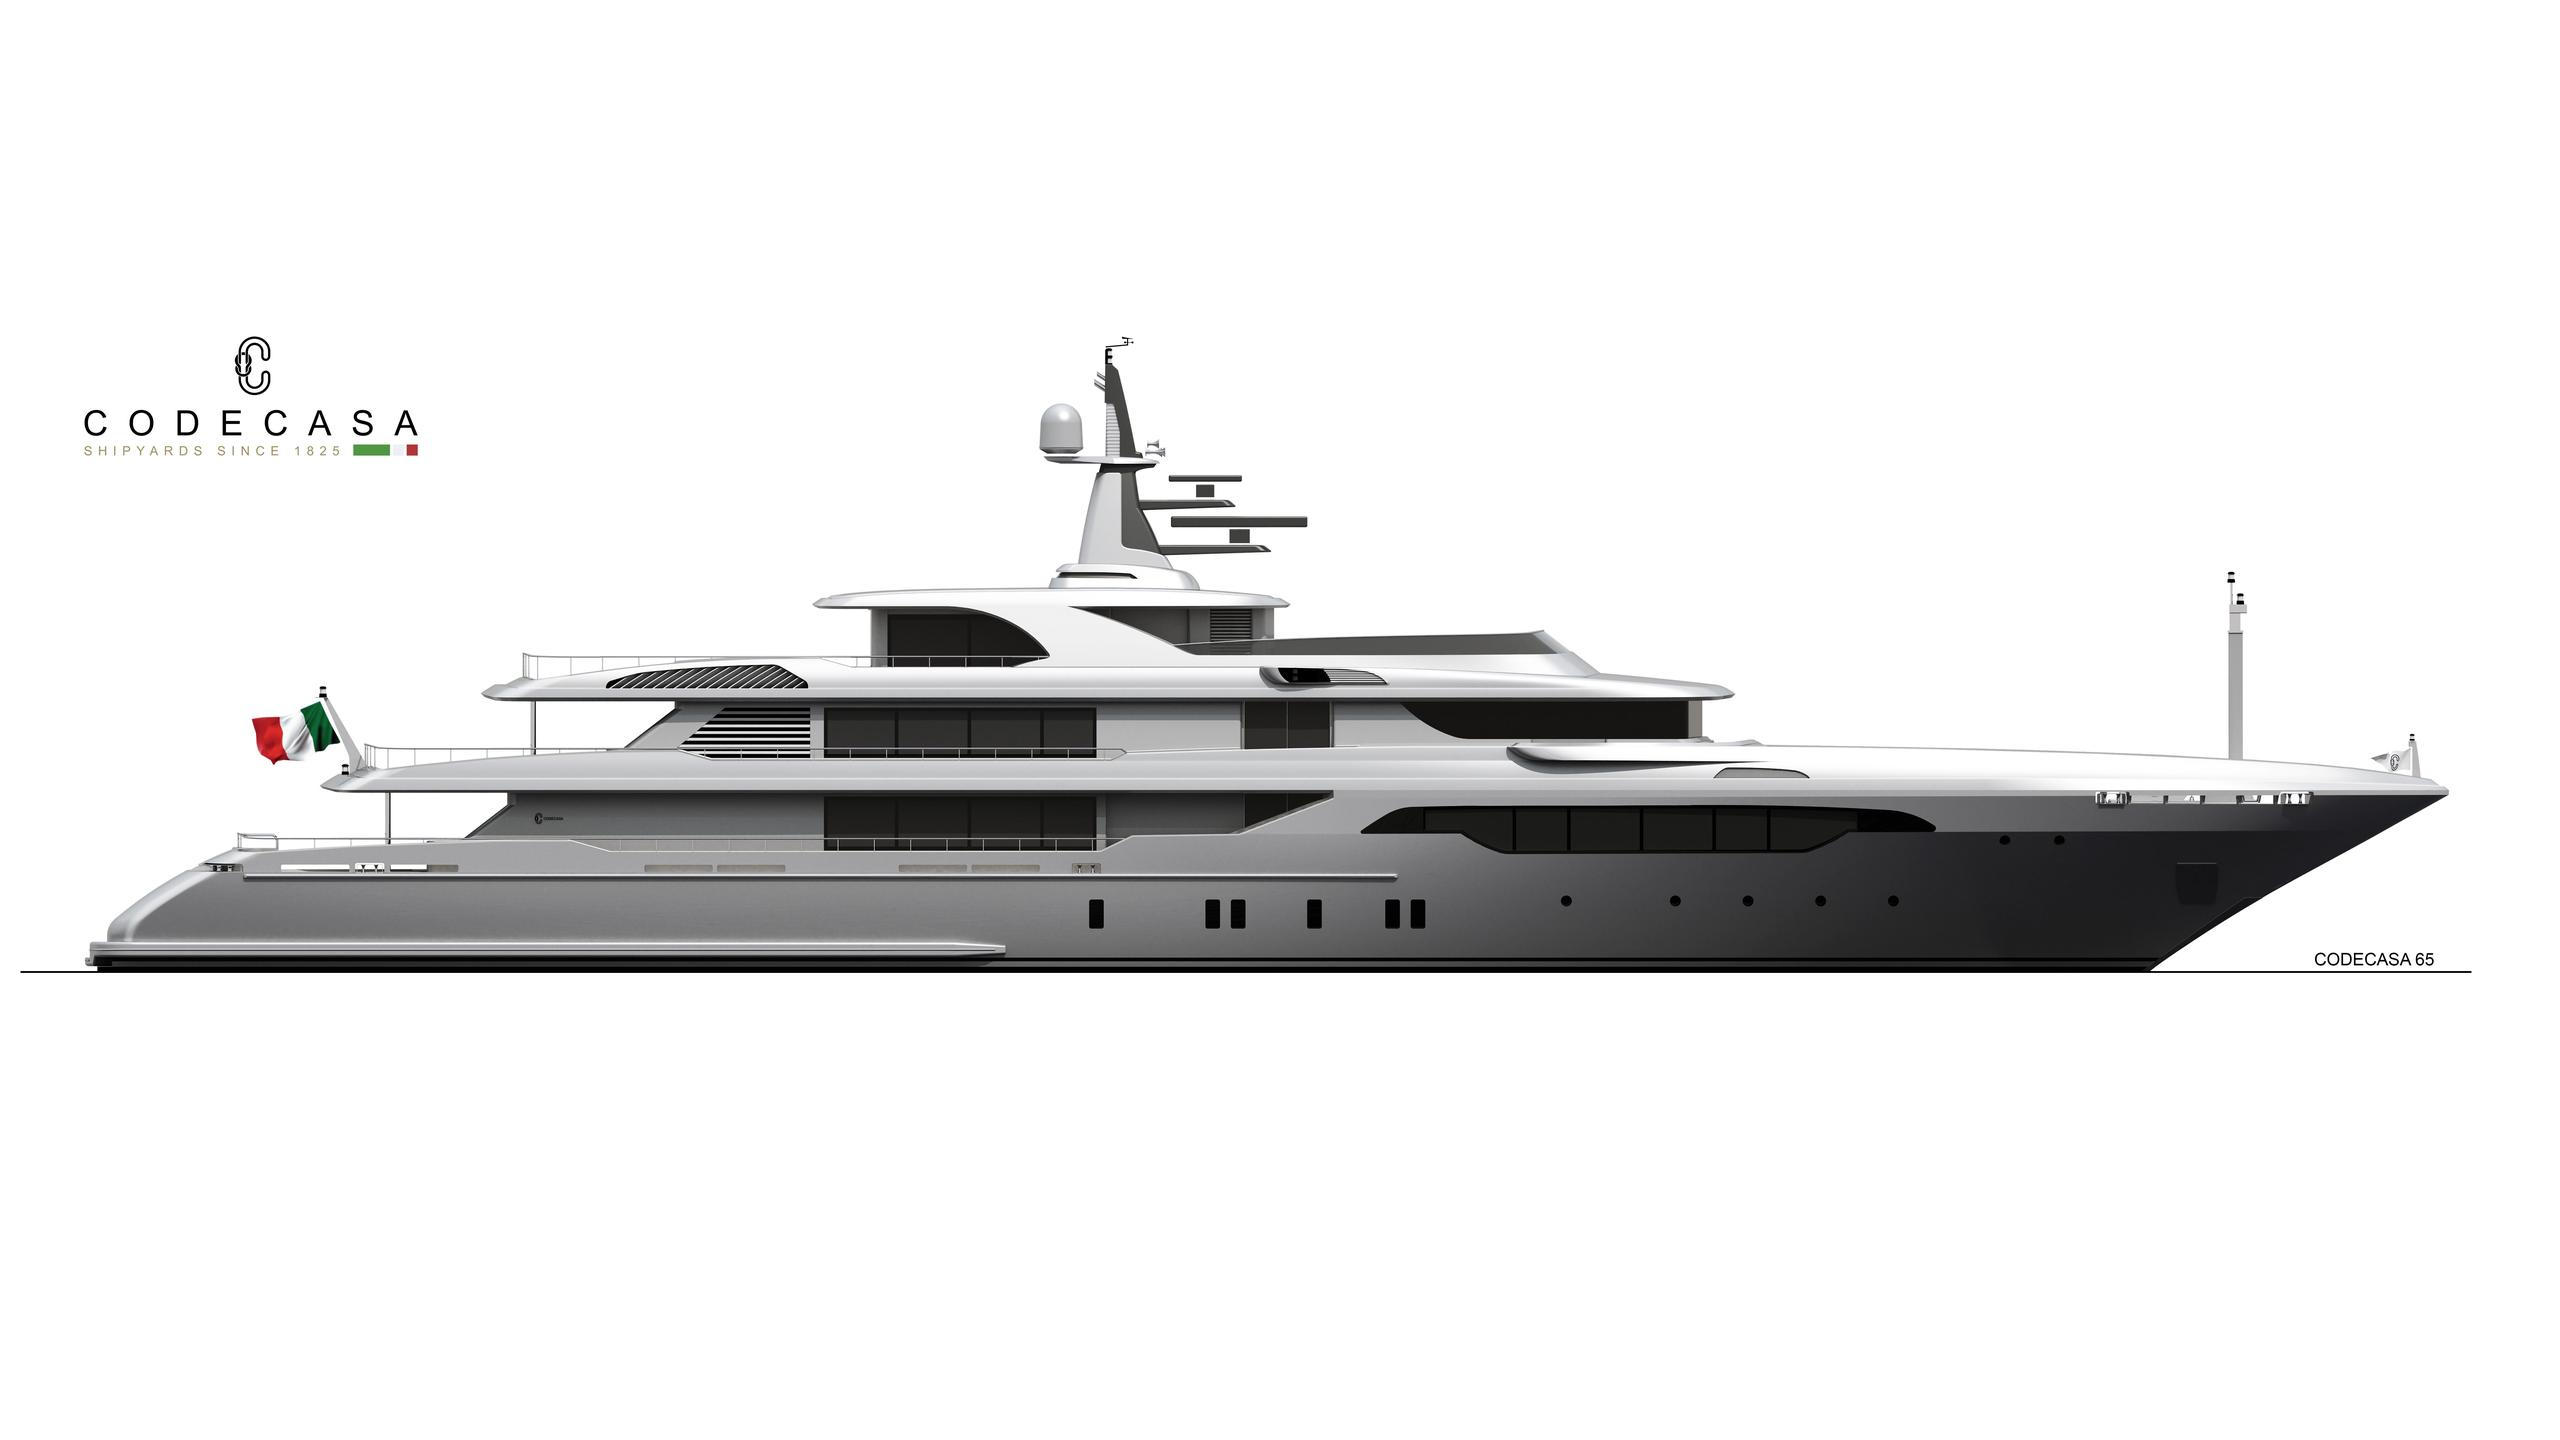 hull f74 motoryacht codecasa 65m 2019 rendering